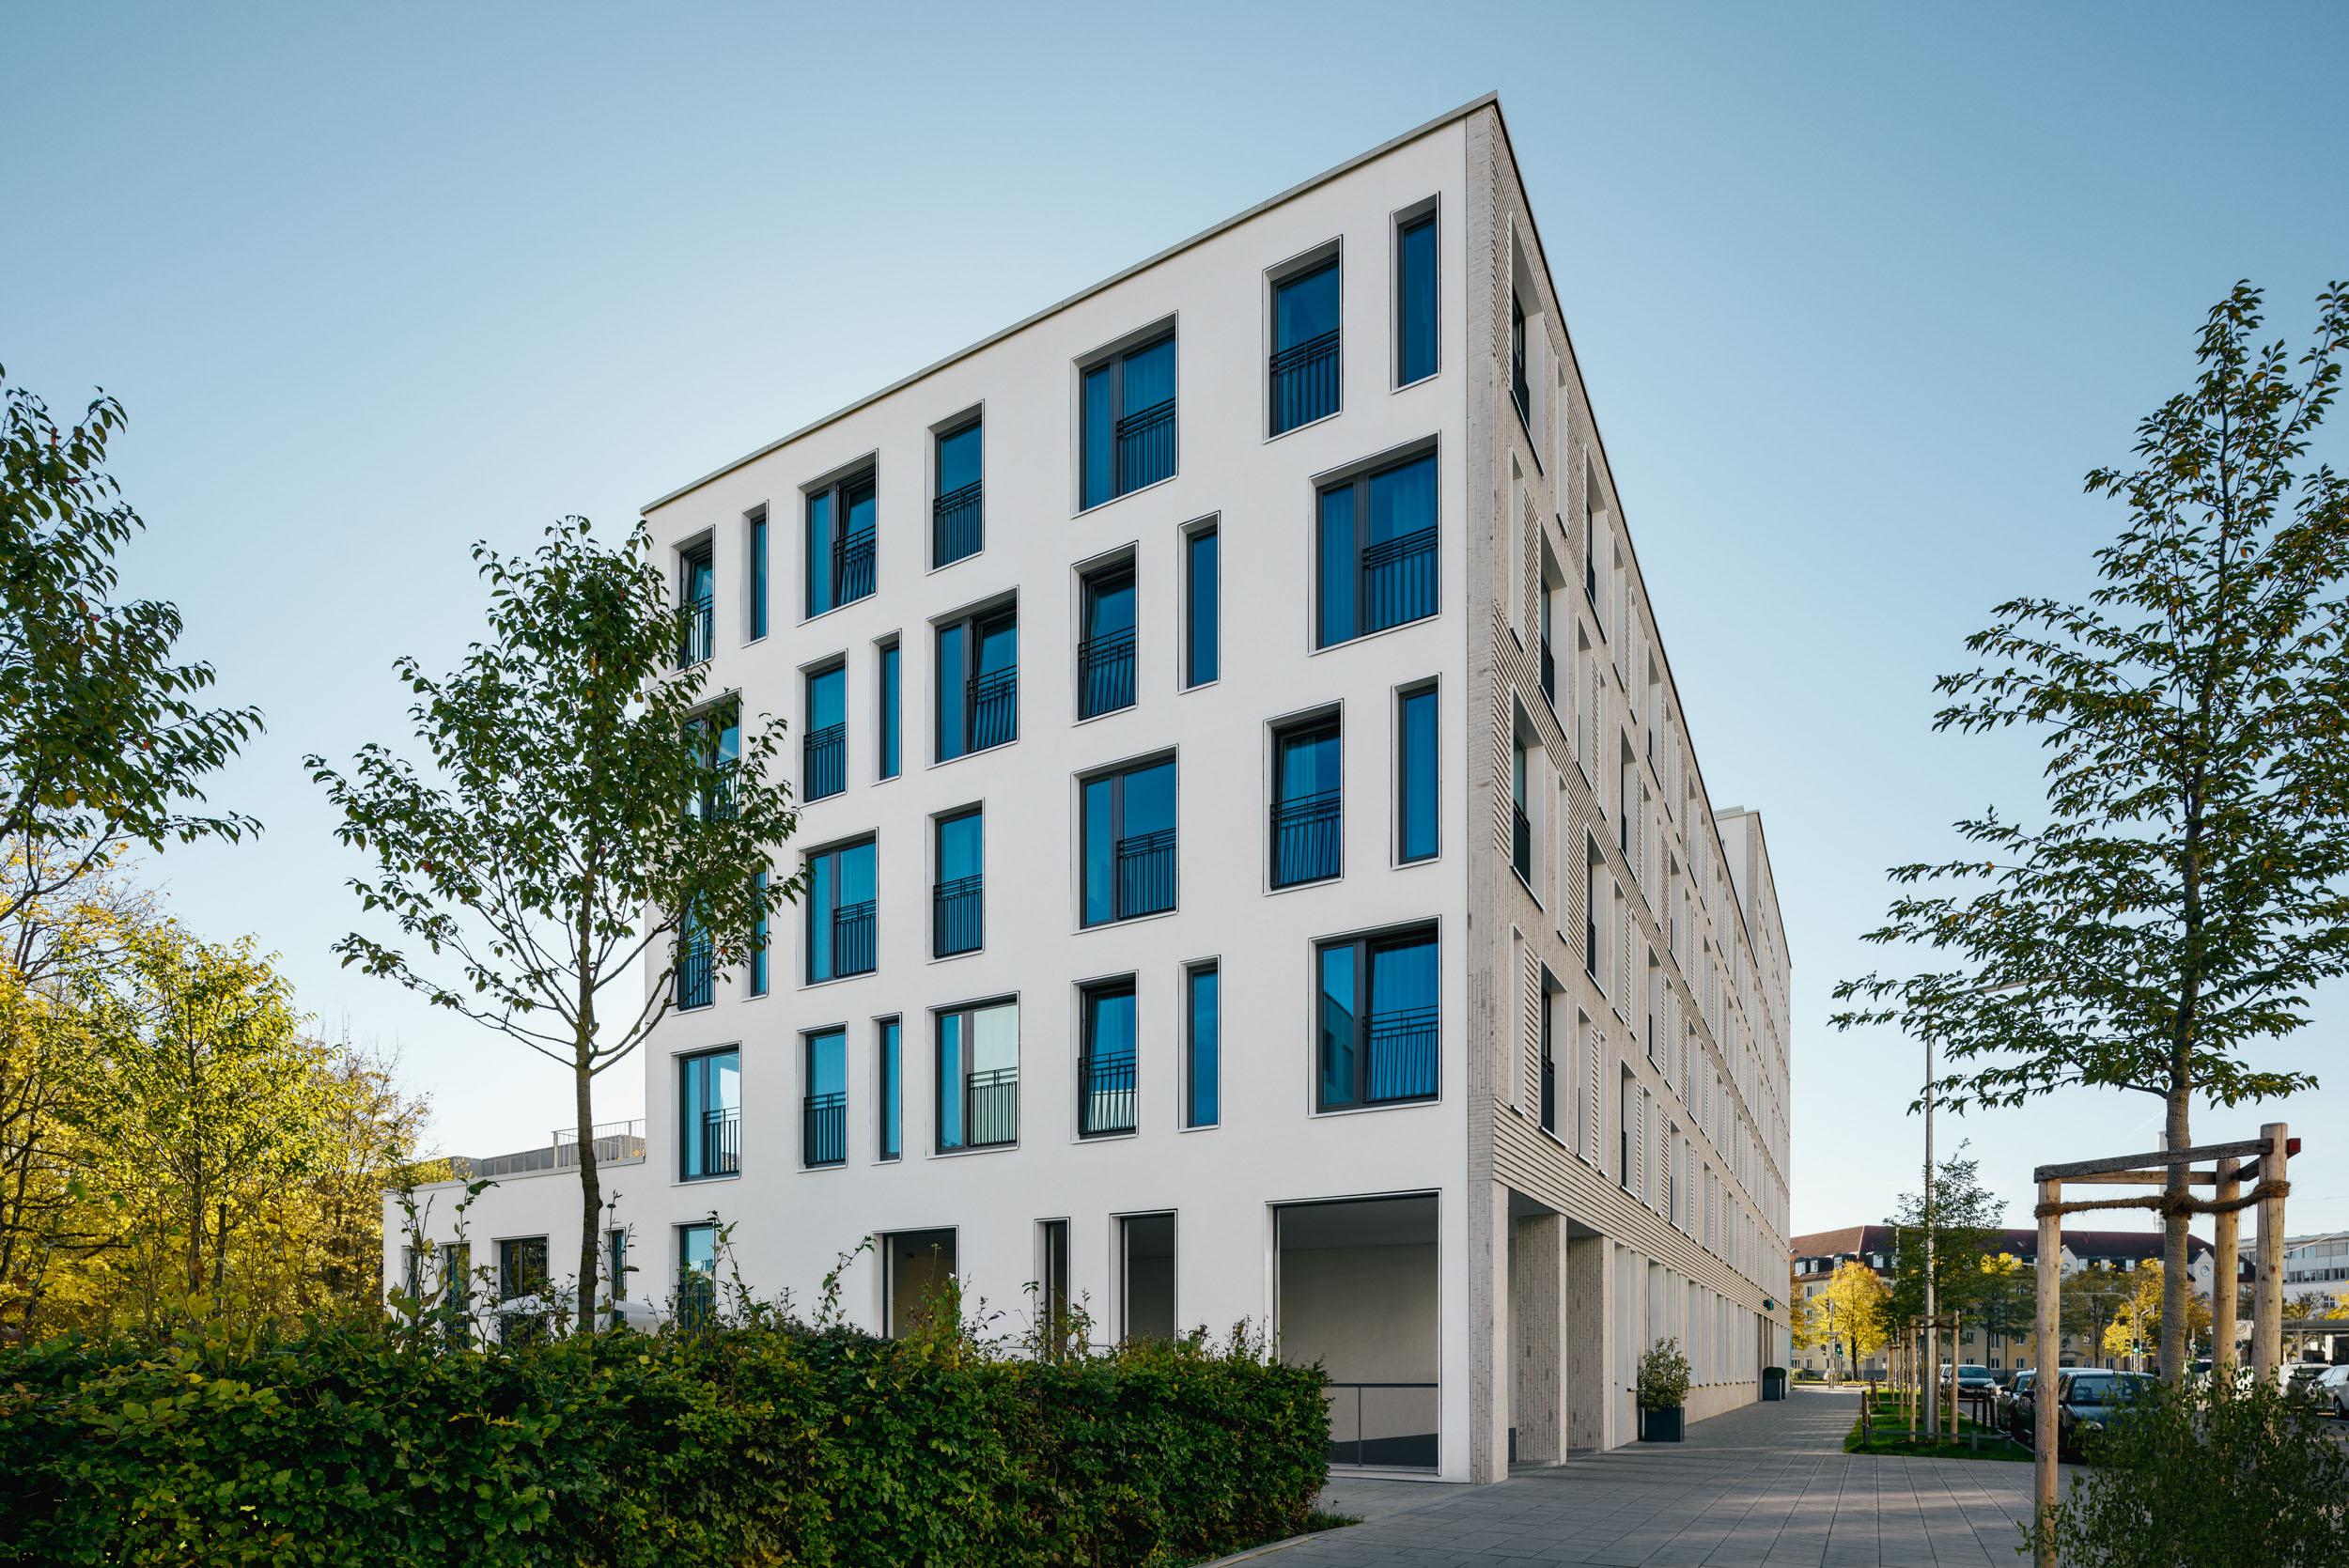 Gustav-Epple-Bauunternehmung-Motel-One-München-Olympiagate-MLX8559